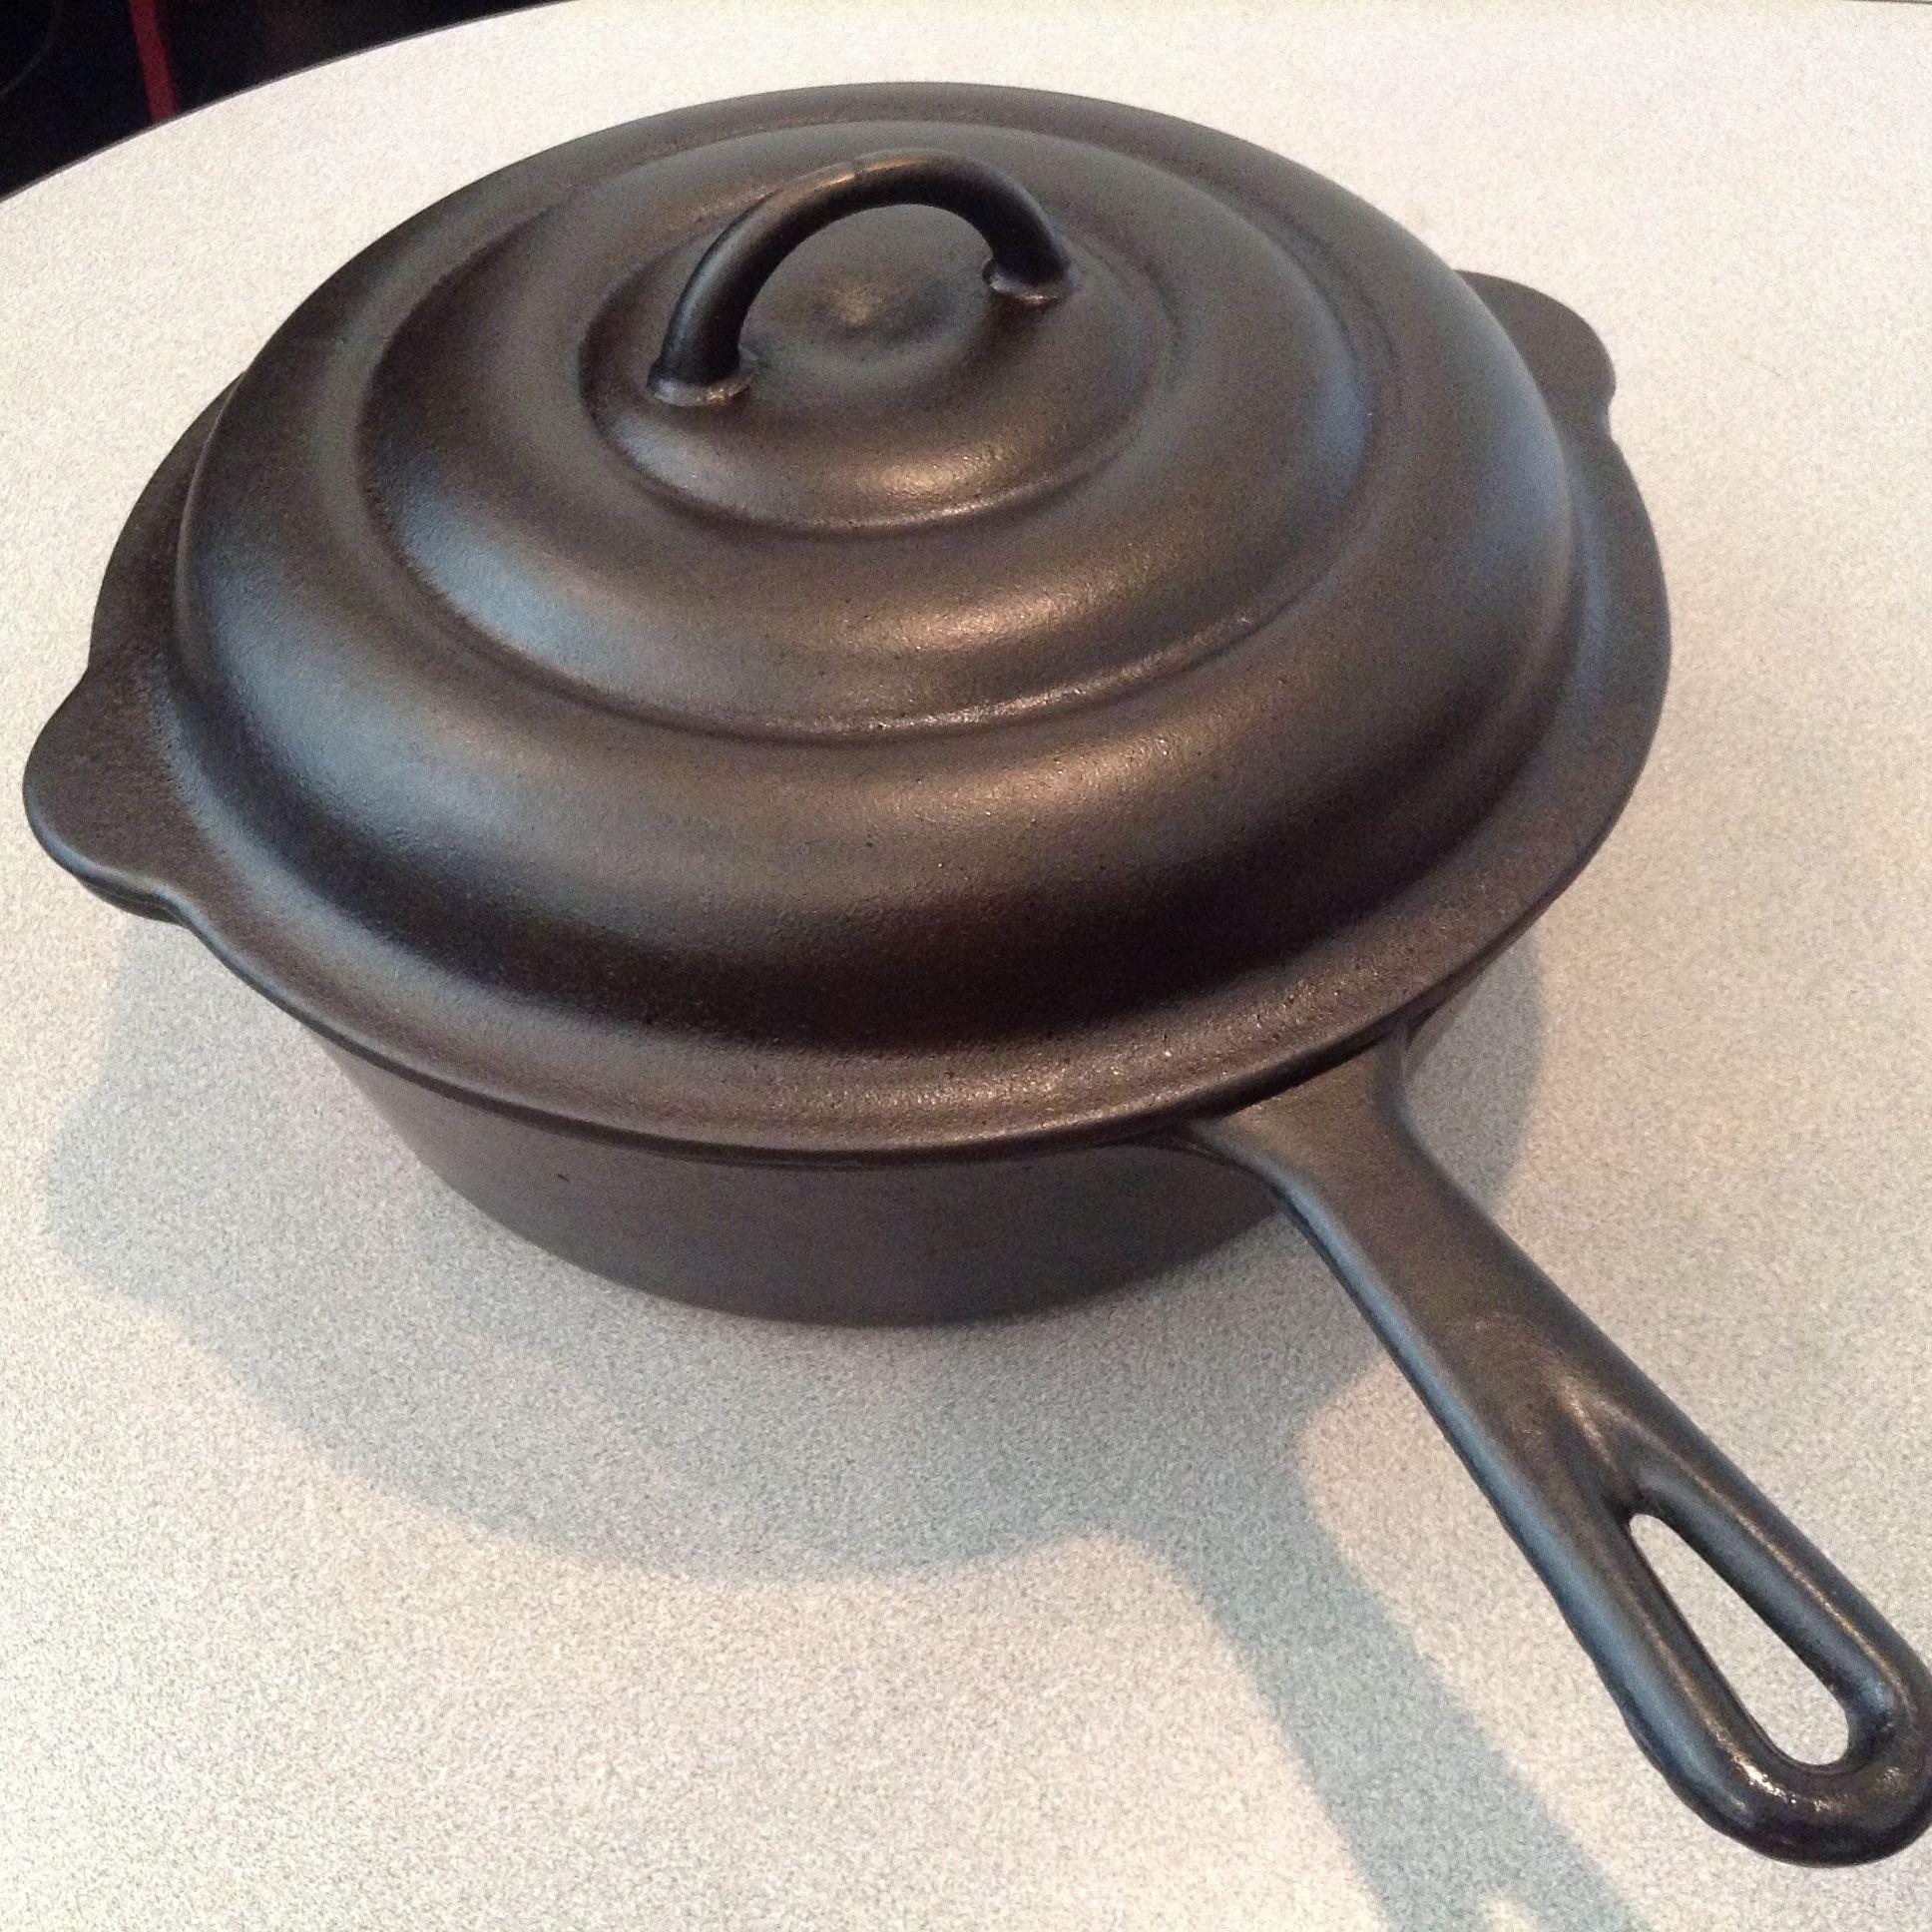 8 Mi Pet Western Foundry Chicken Fryer On The Bottom It Reads Keeps Foods Tasty Cast Iron Cookware Cast Iron Cooking Cast Iron Recipes